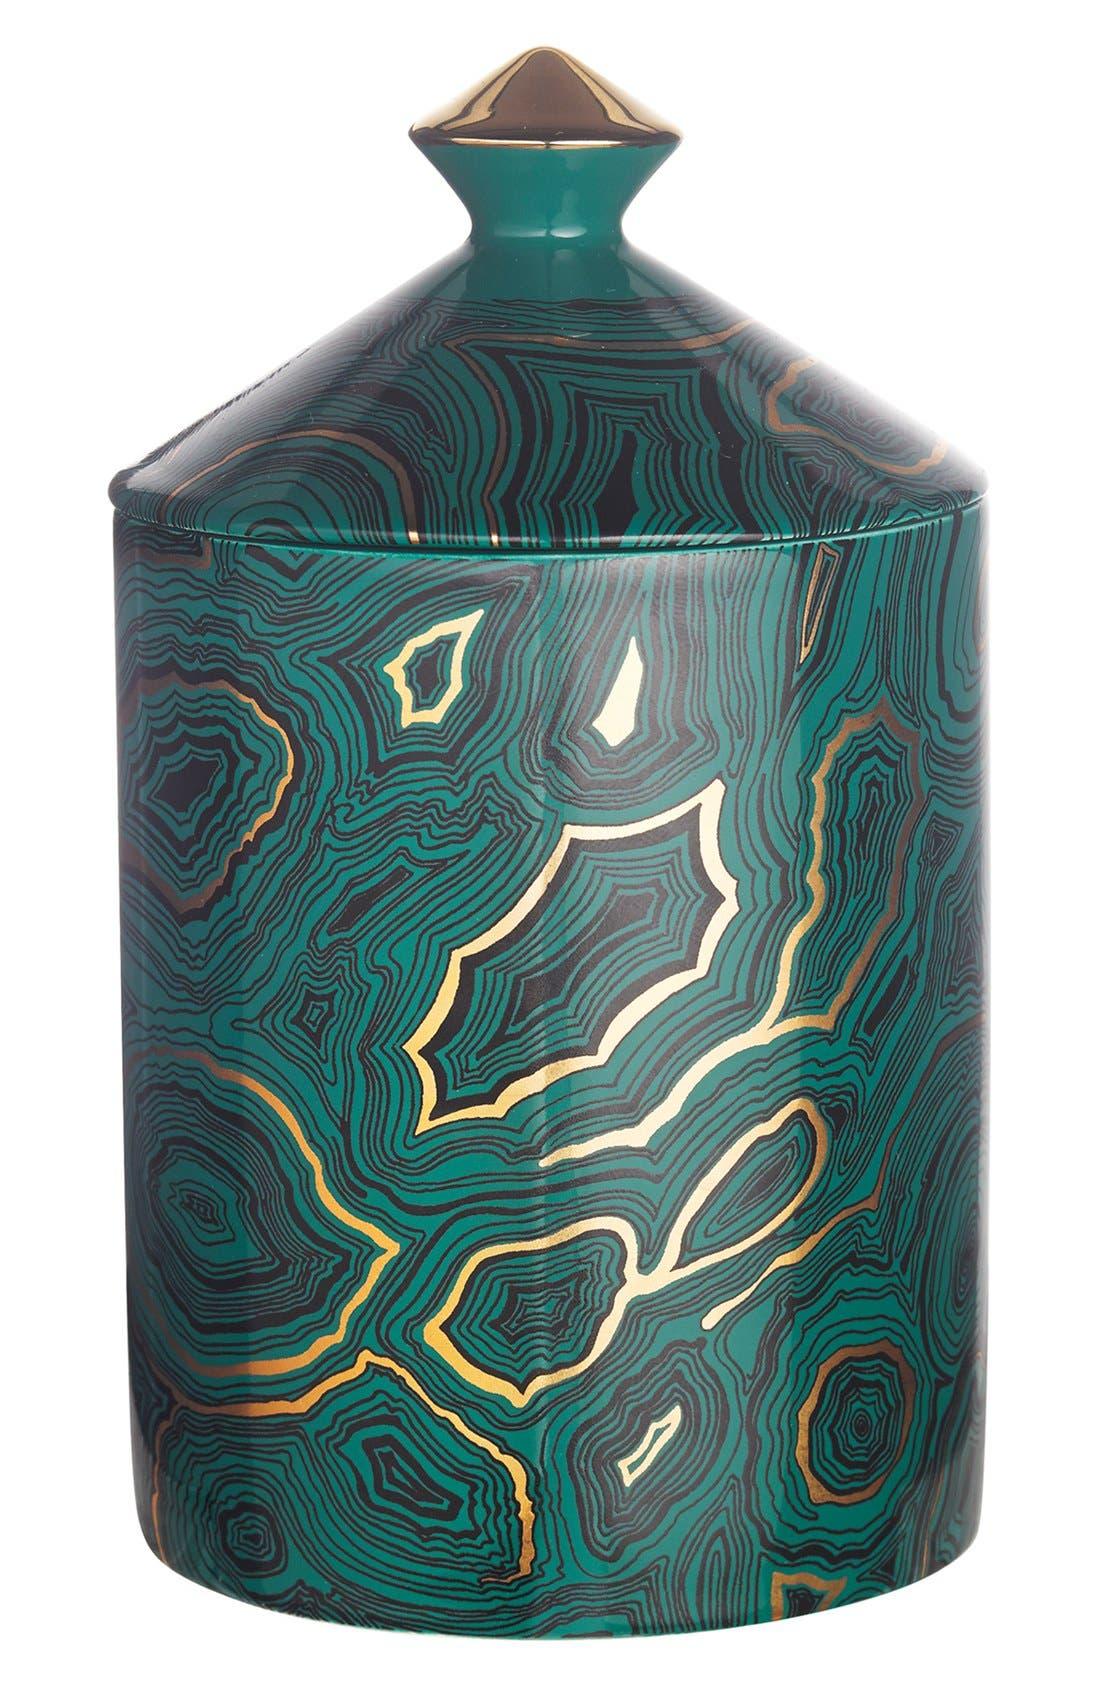 Fornasetti 'Malachite' Lidded Candle